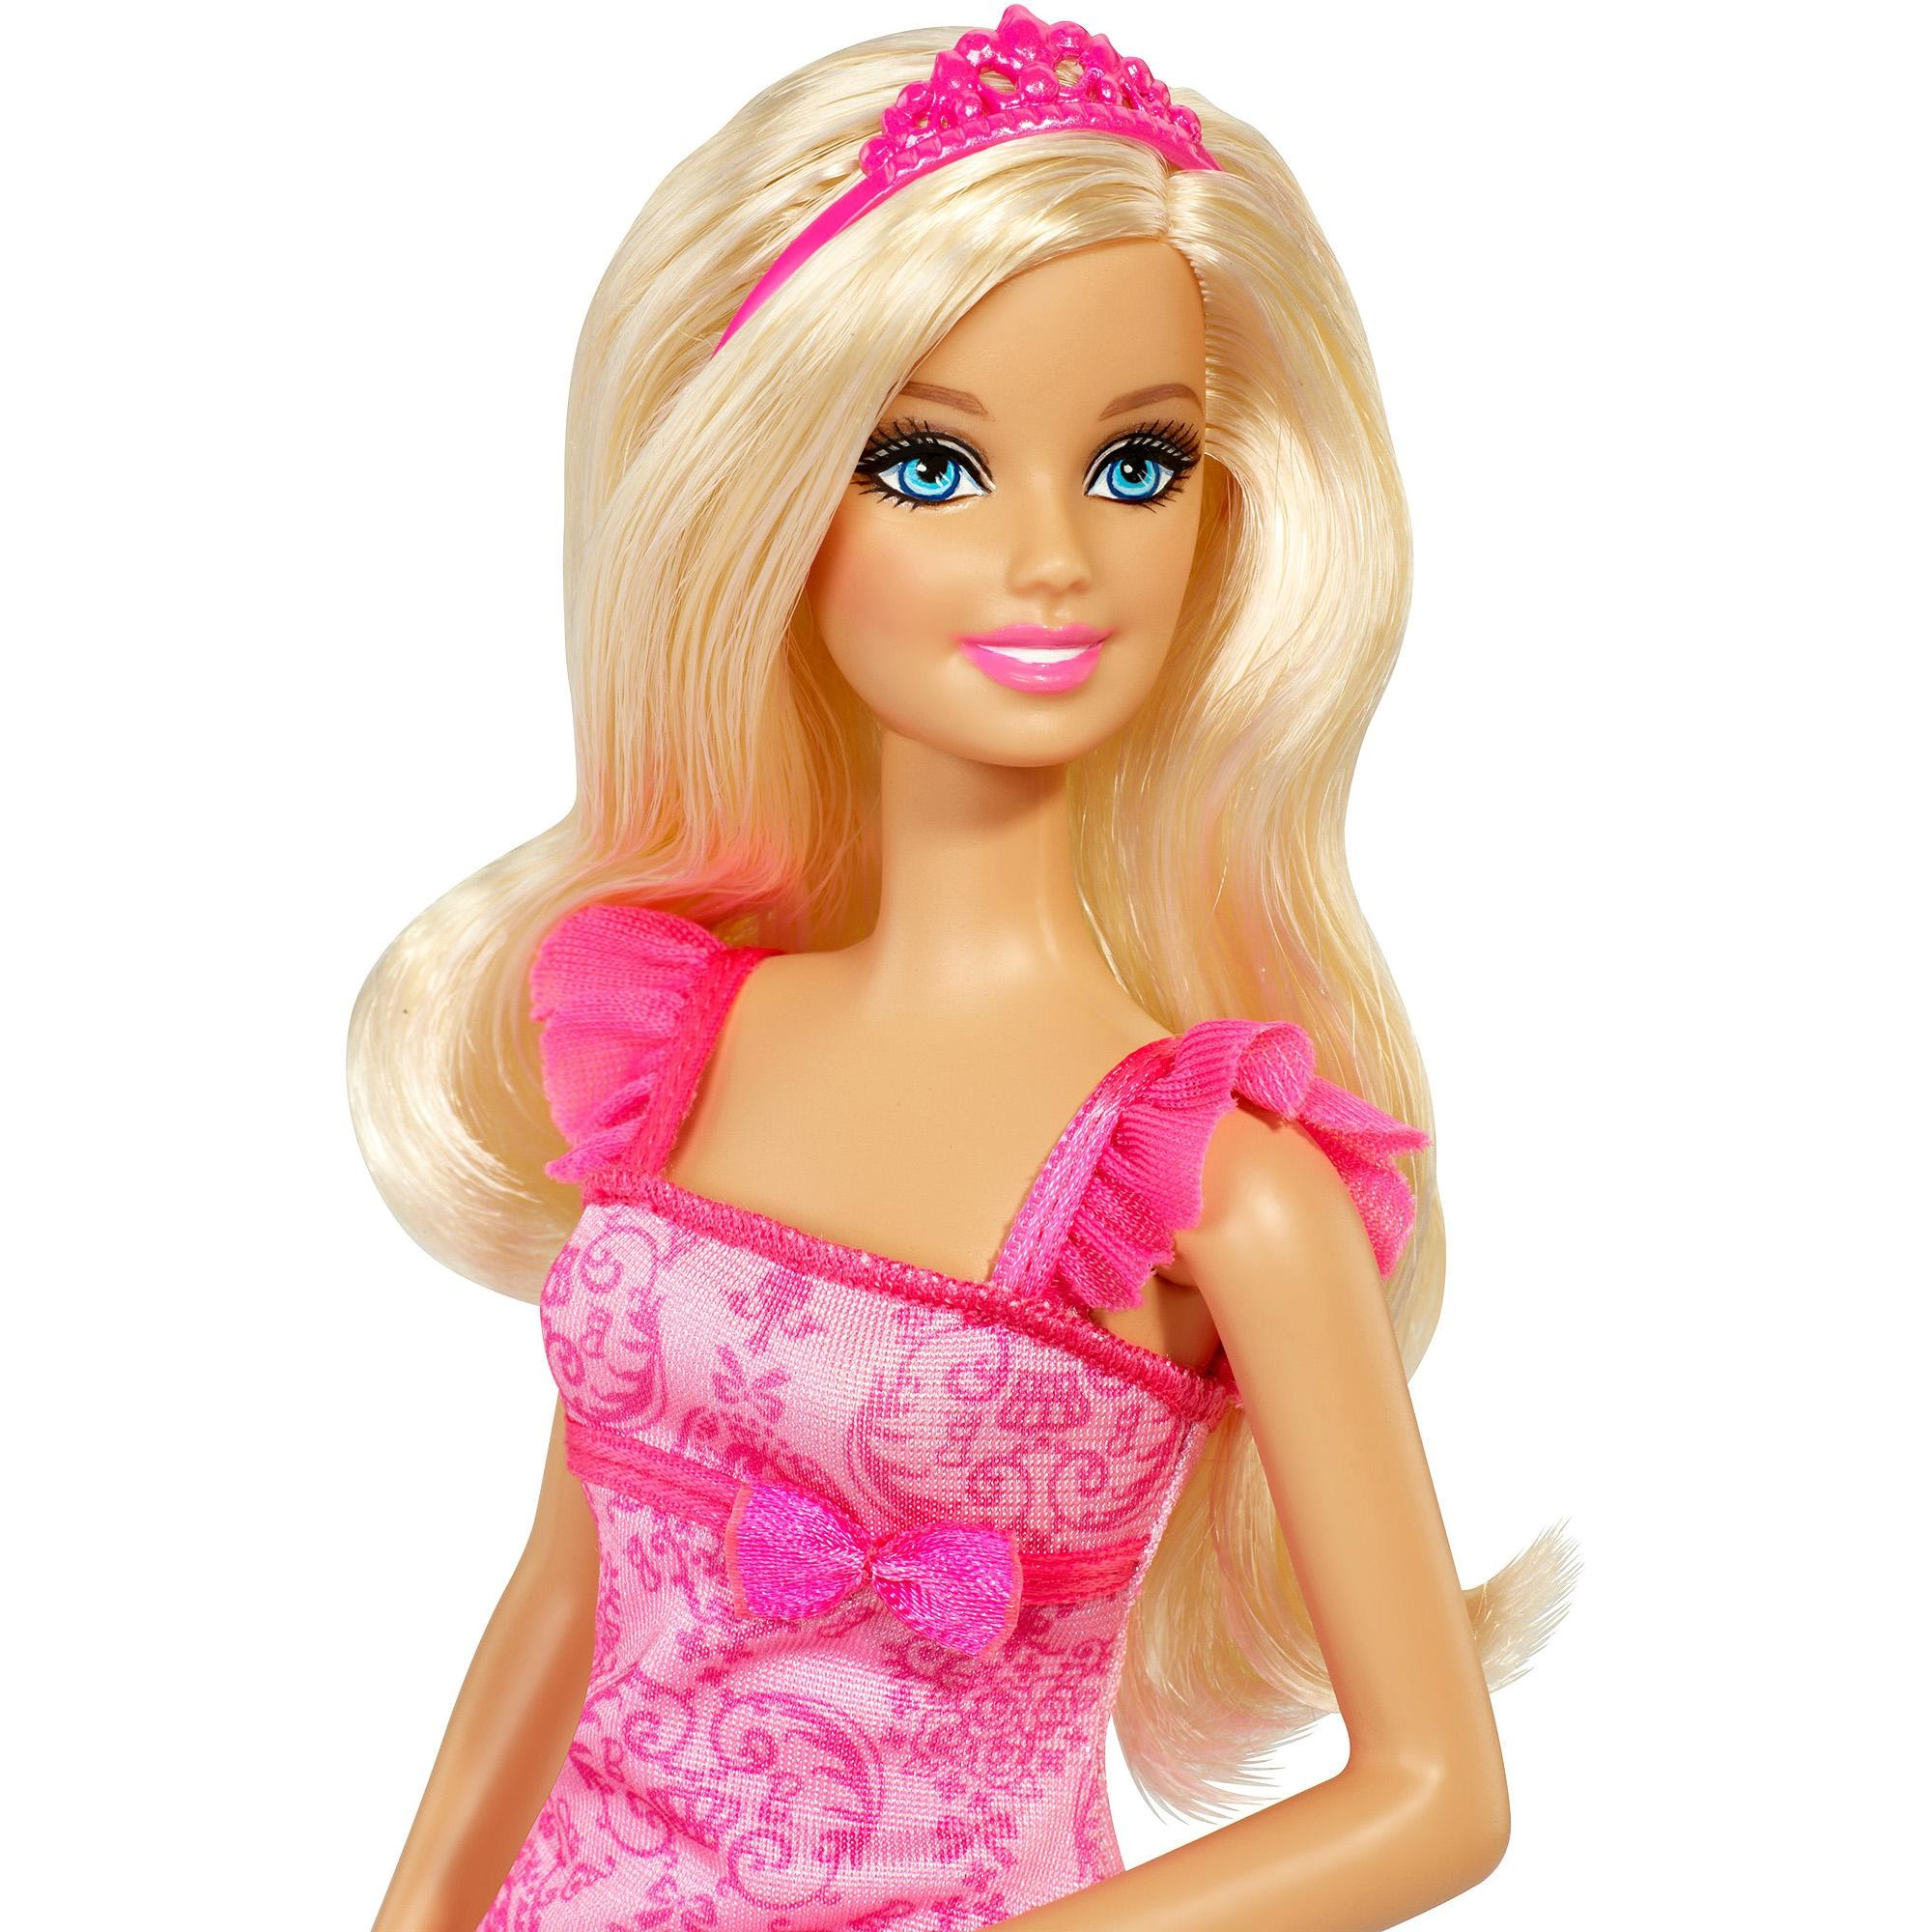 Cute Doll Live Wallpaper: Barbie Screensavers Wallpapers (73+ Images